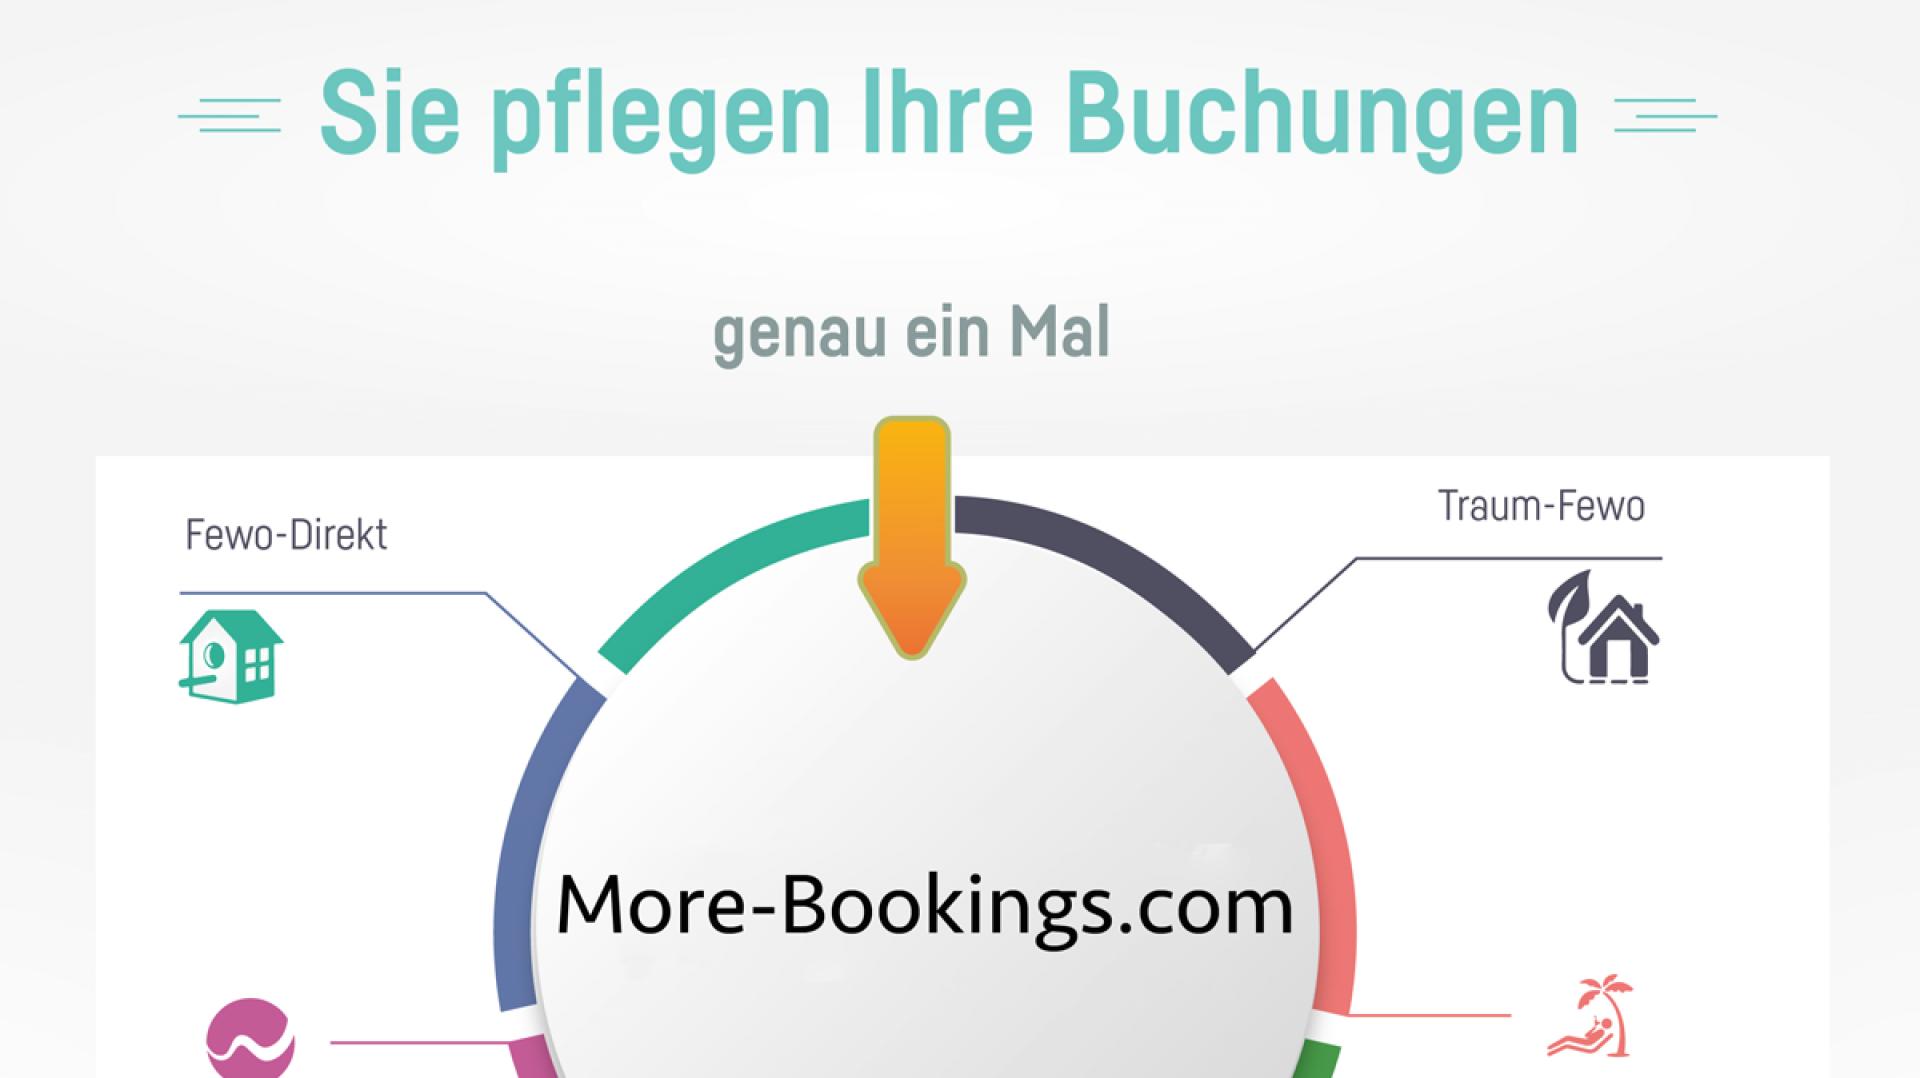 More-Bookings.com